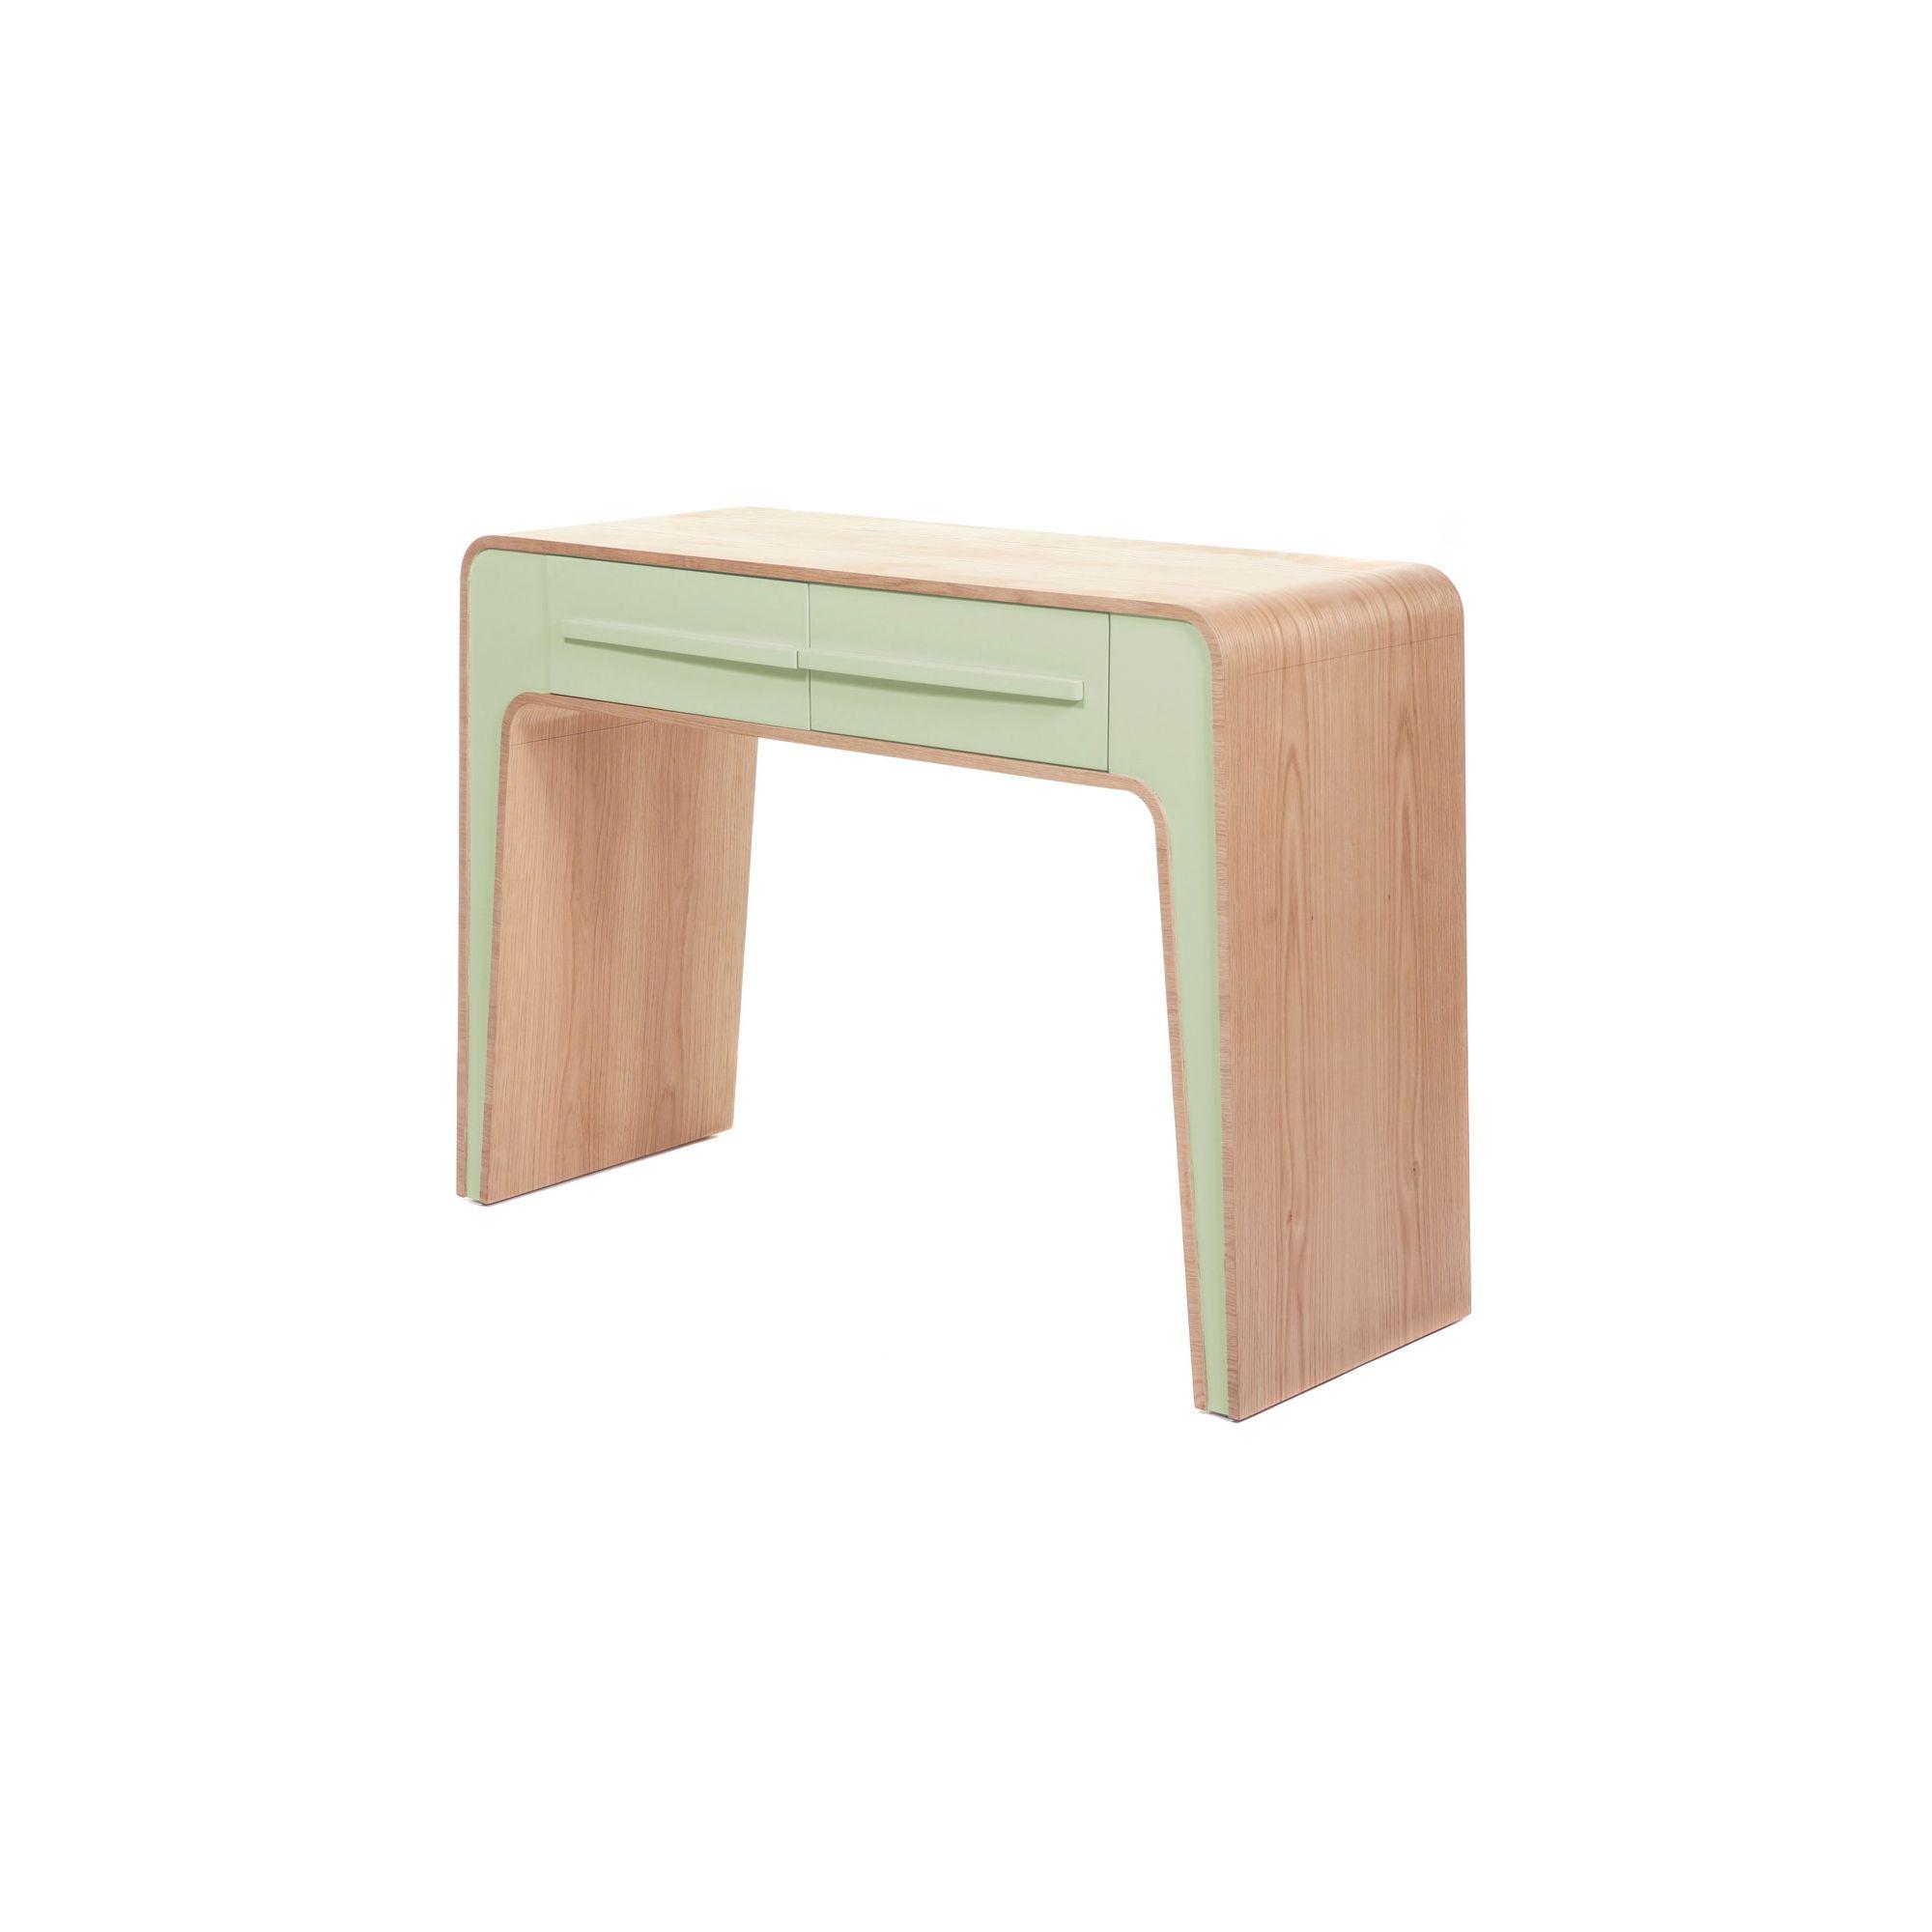 Stil Furniture Kontur Oak Console Table